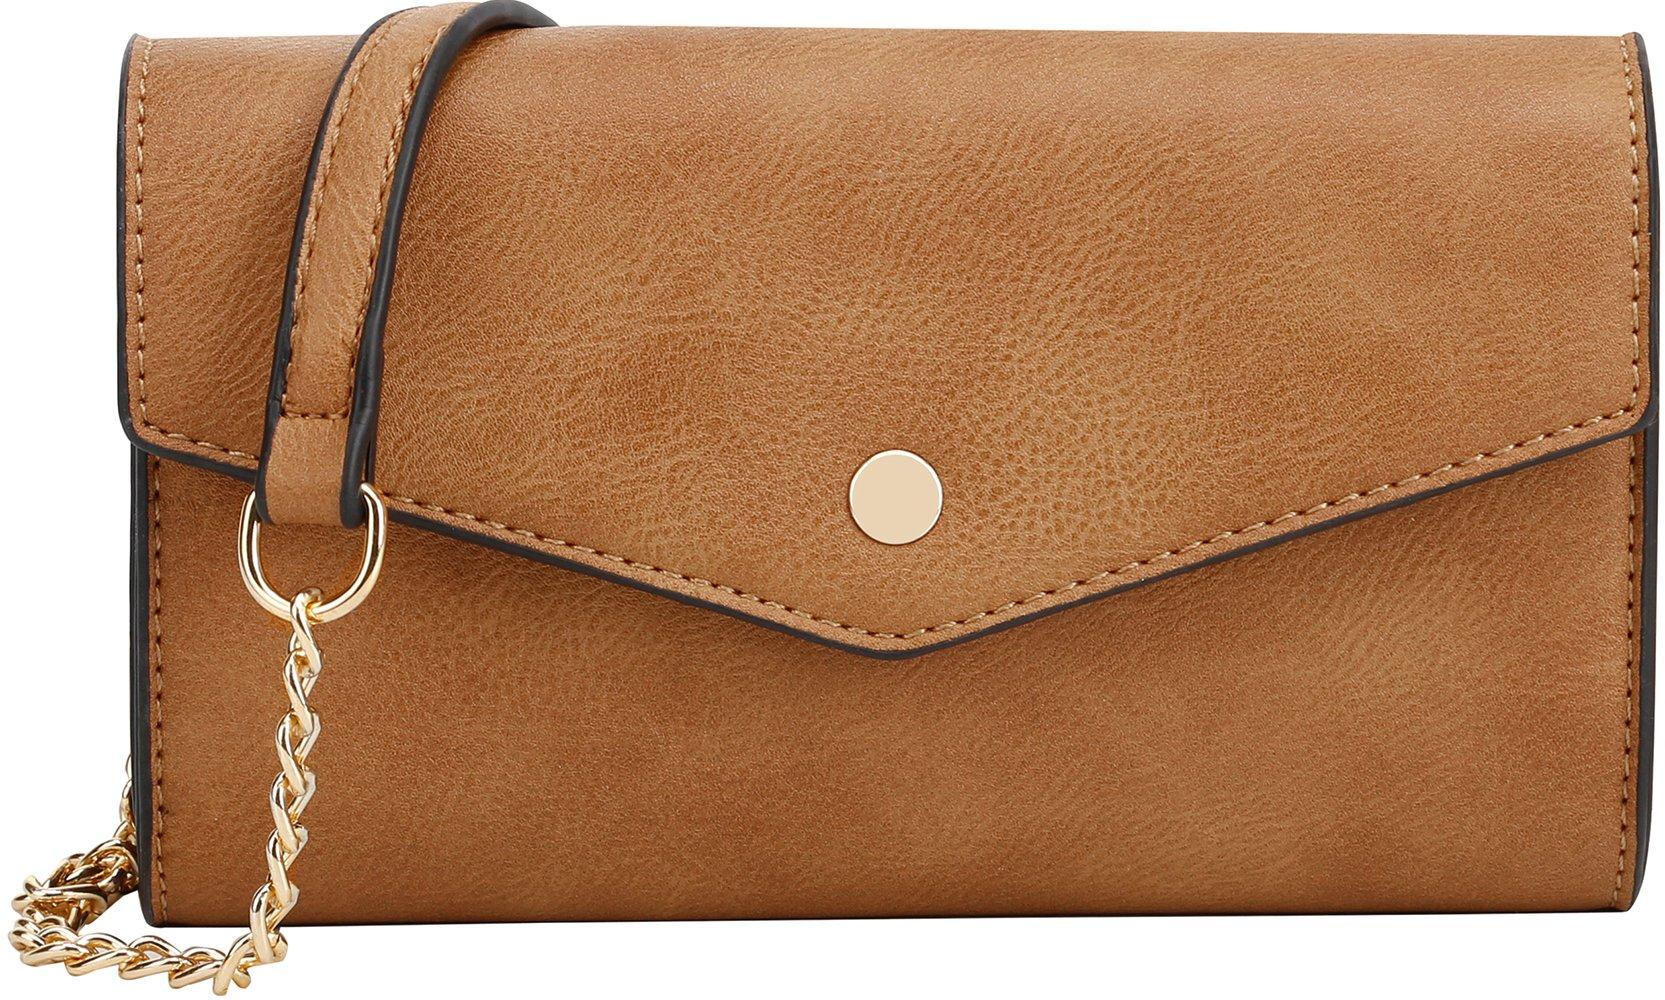 Lily Jane Women's Clutch Crossbody Wallet with Chain Strap (Mustard)